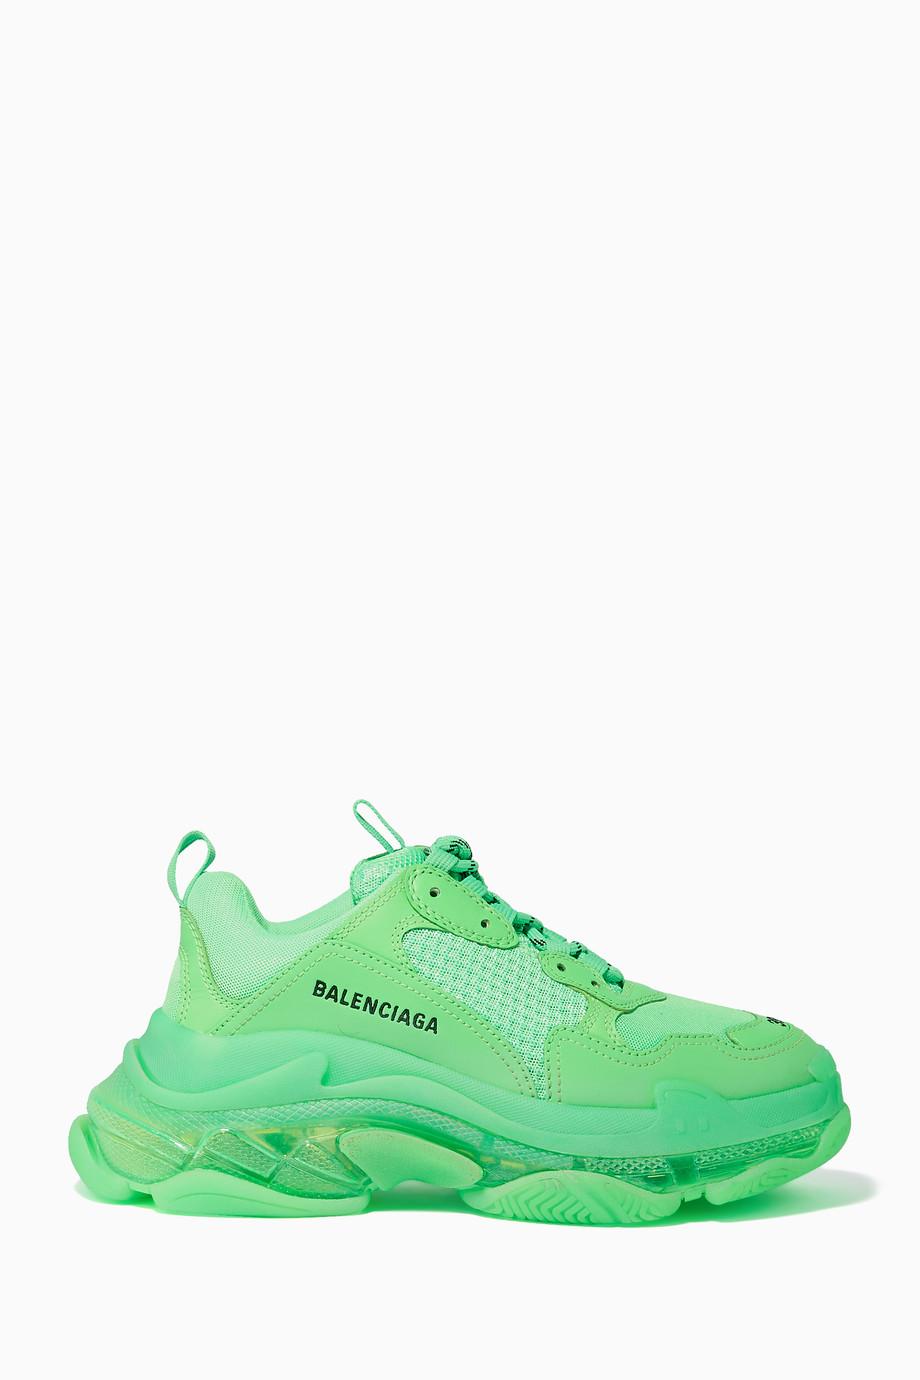 wholesale meet 2018 shoes Shop Balenciaga Green Triple S Low-Top Sneakers for Women